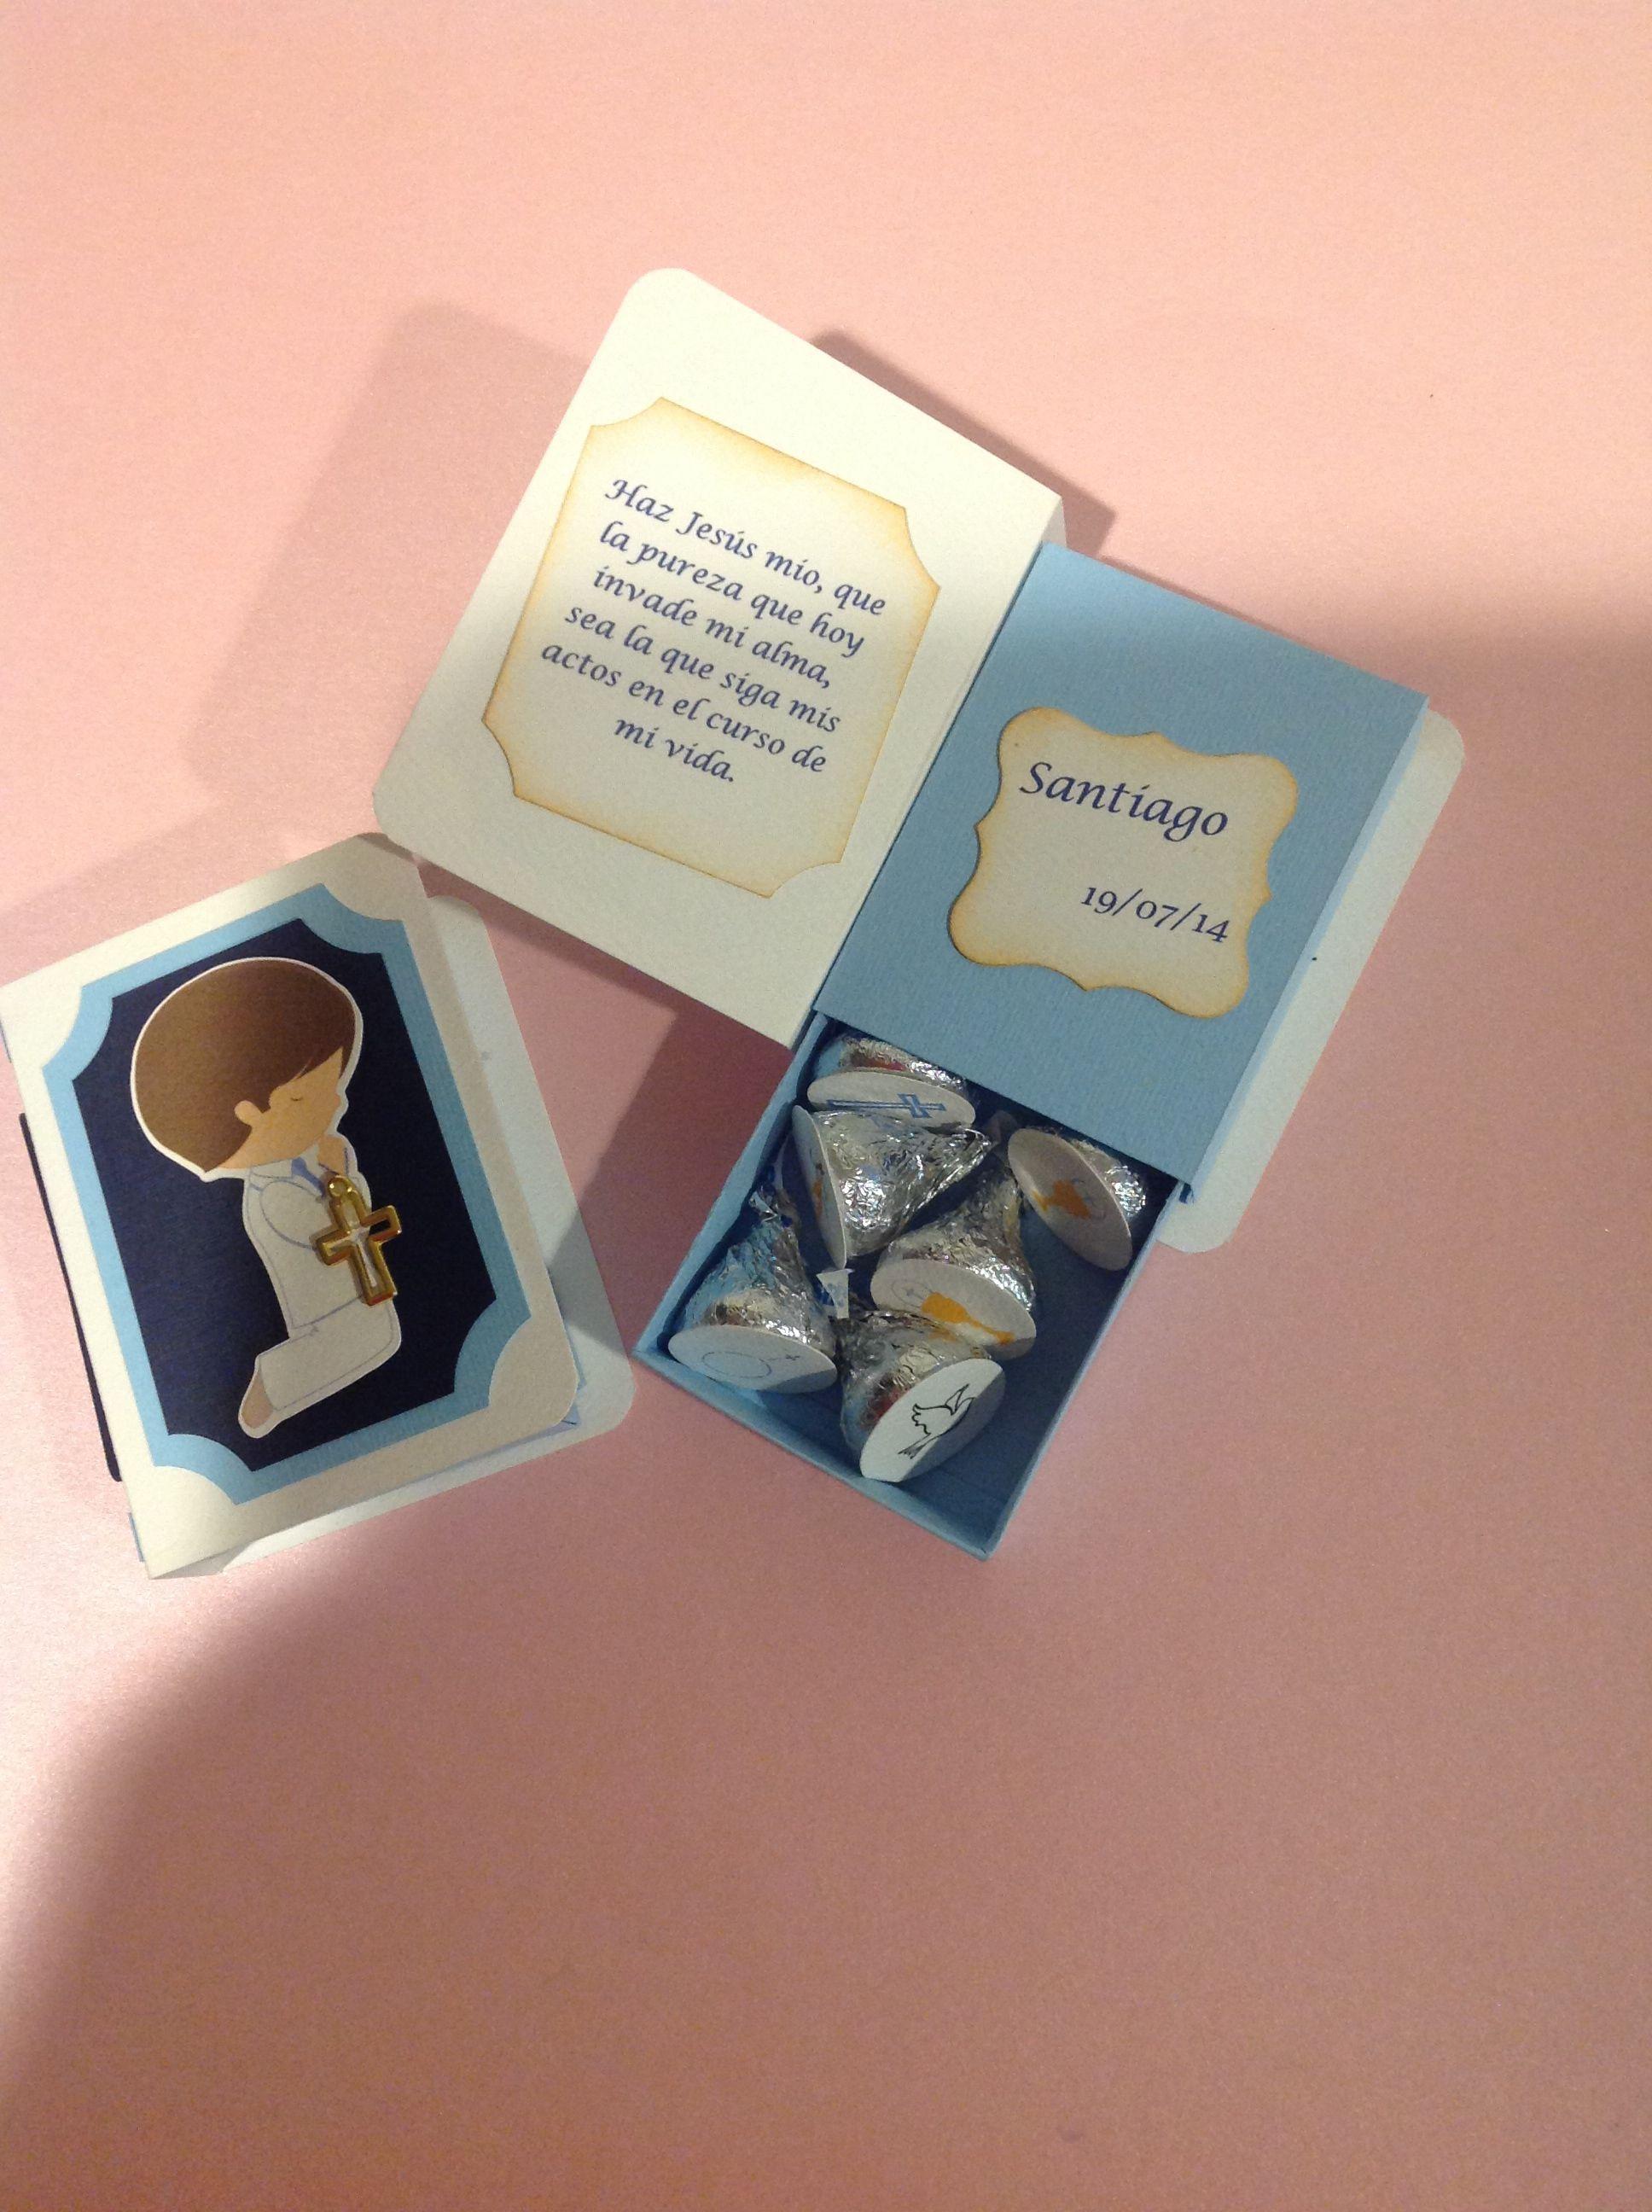 Cajita En Forma De Libro Con Kisses Ideal Para Primera Comunión Recuerdos Creativos Recuerdos De Bautizo Cajitas Para Dulces